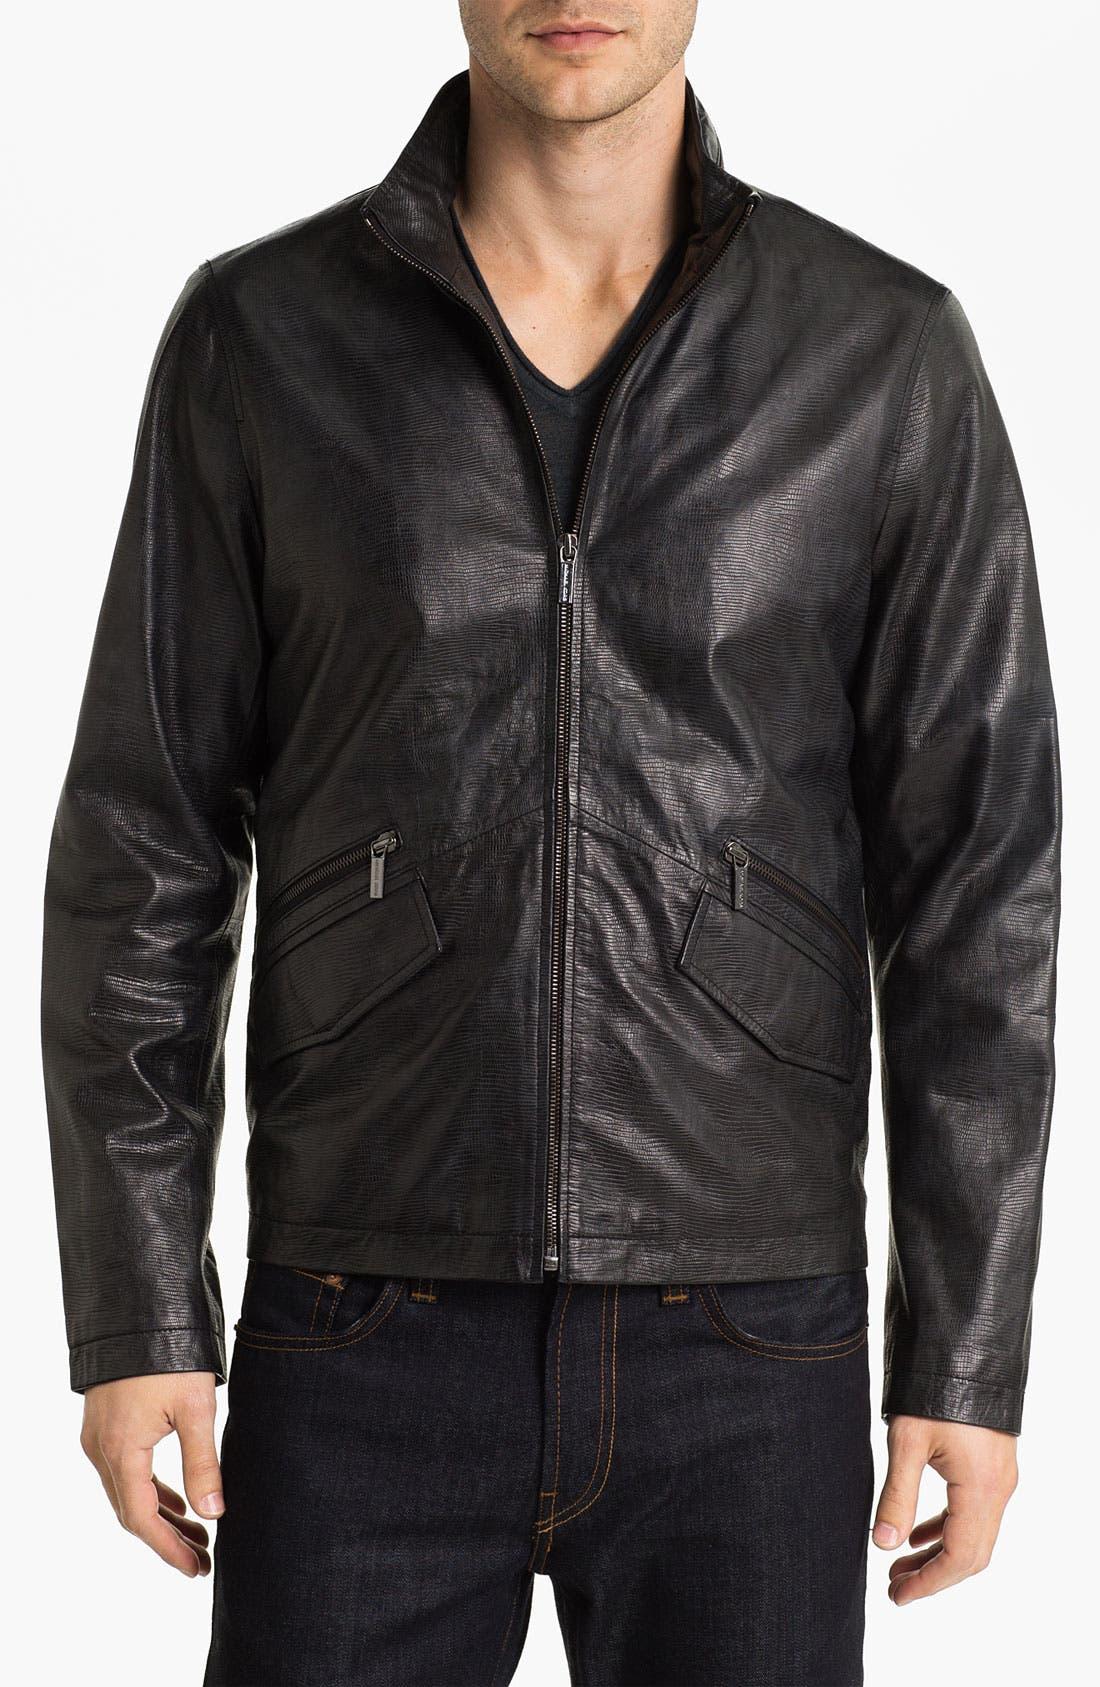 Alternate Image 1 Selected - Michael Kors Embossed Leather Jacket (Online Exclusive)